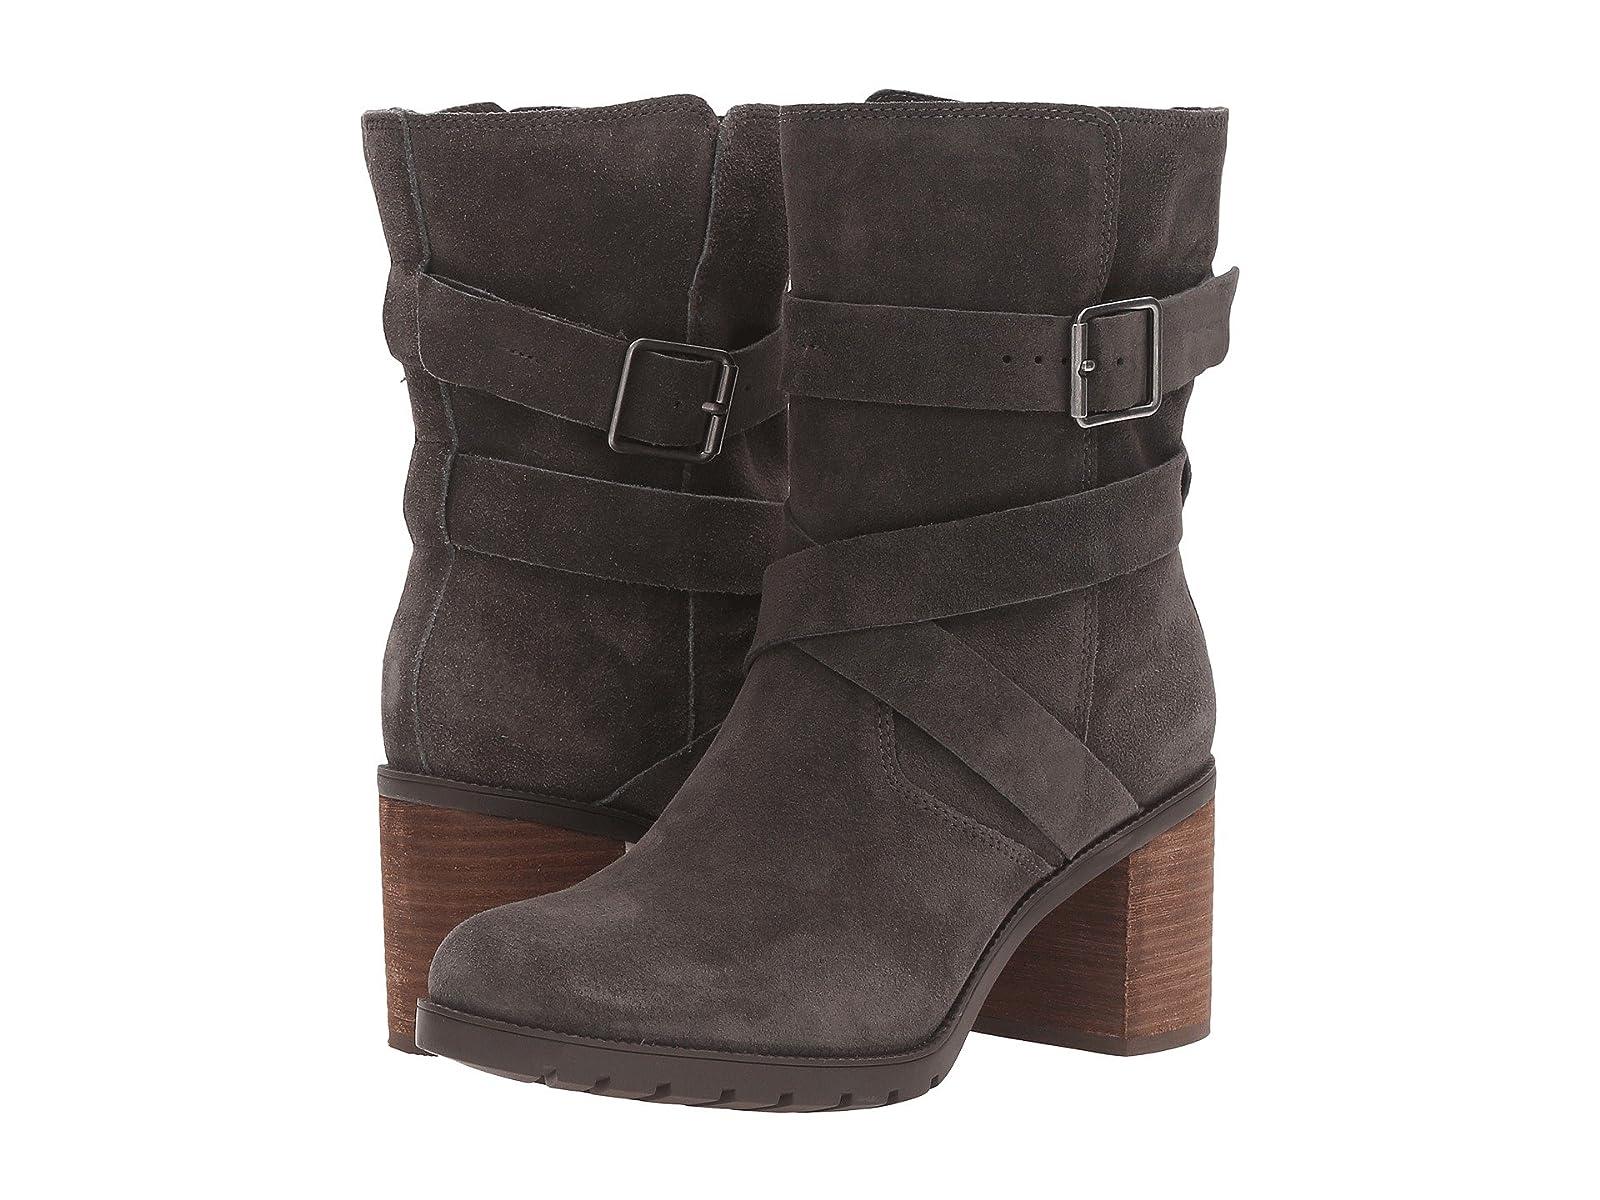 Clarks Malvet DorisCheap and distinctive eye-catching shoes